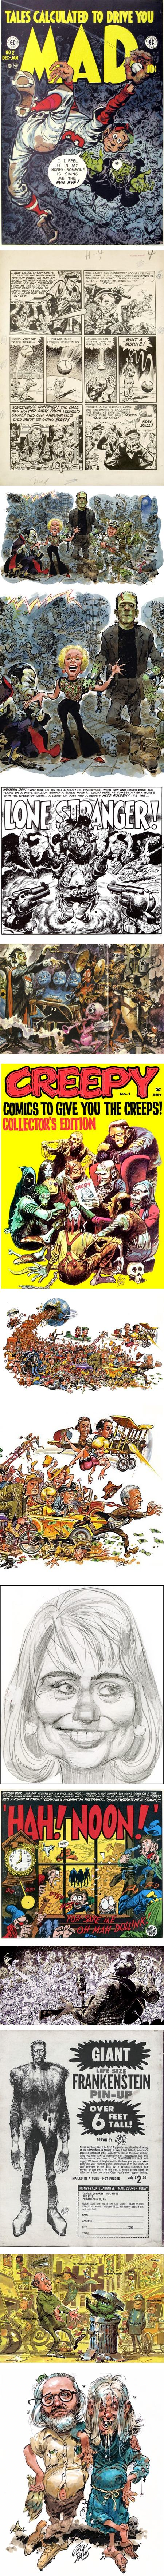 Jack Davis, cartoonist, caricaturist, comics artist illustrator